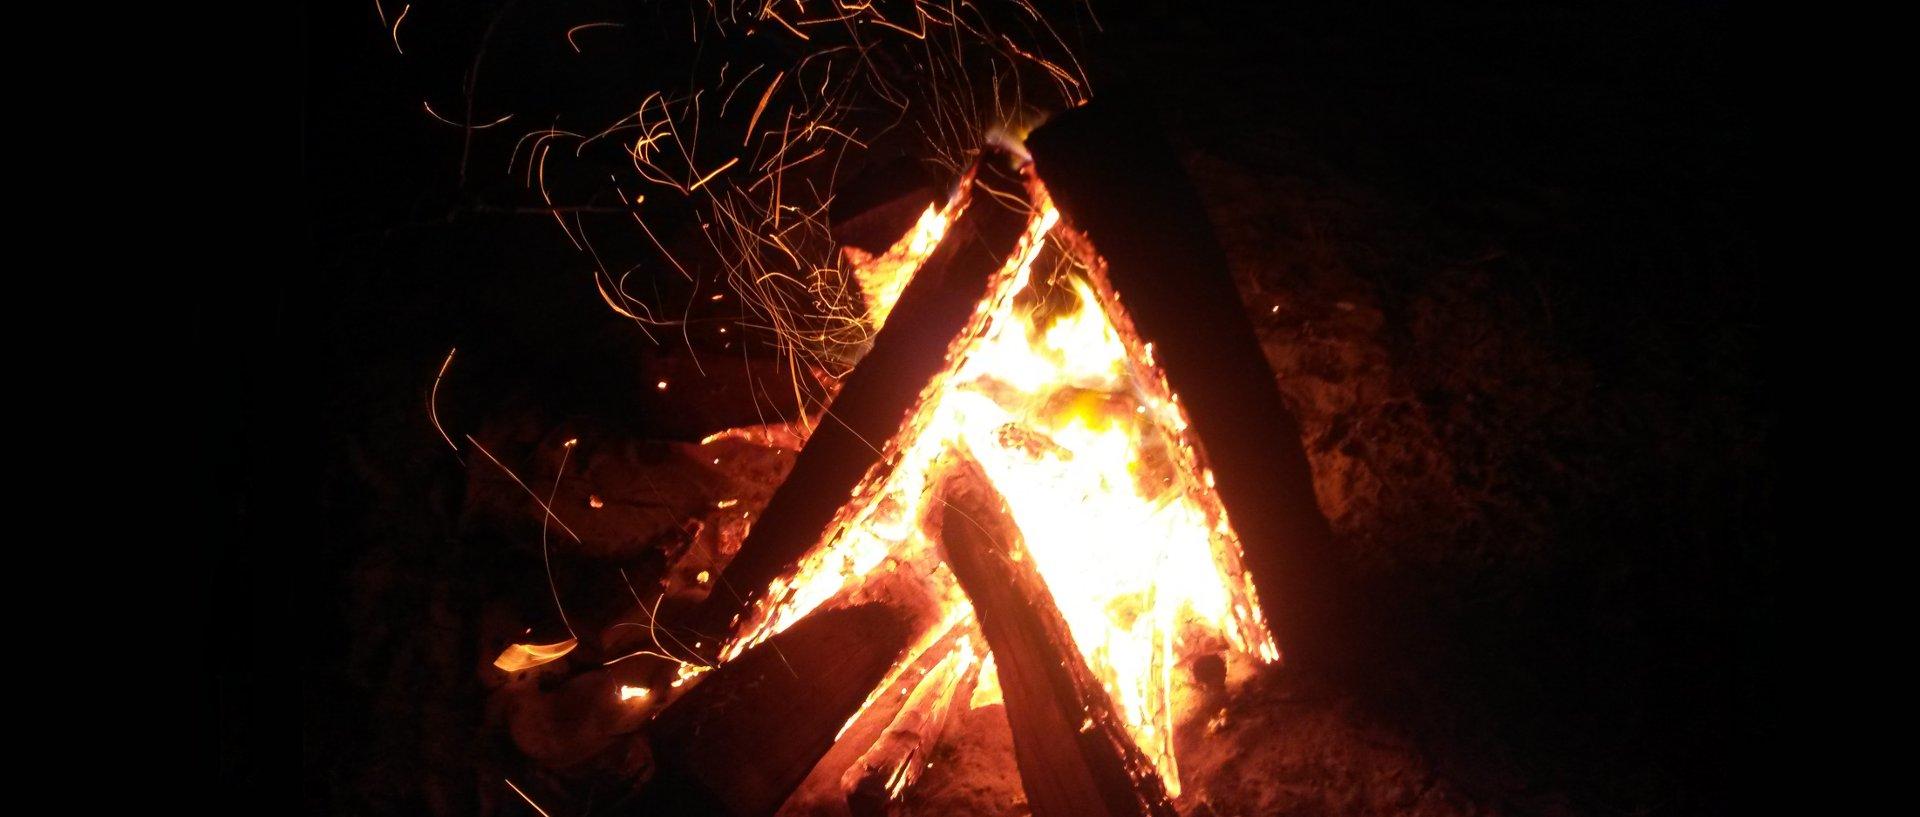 Ognisko w nocy